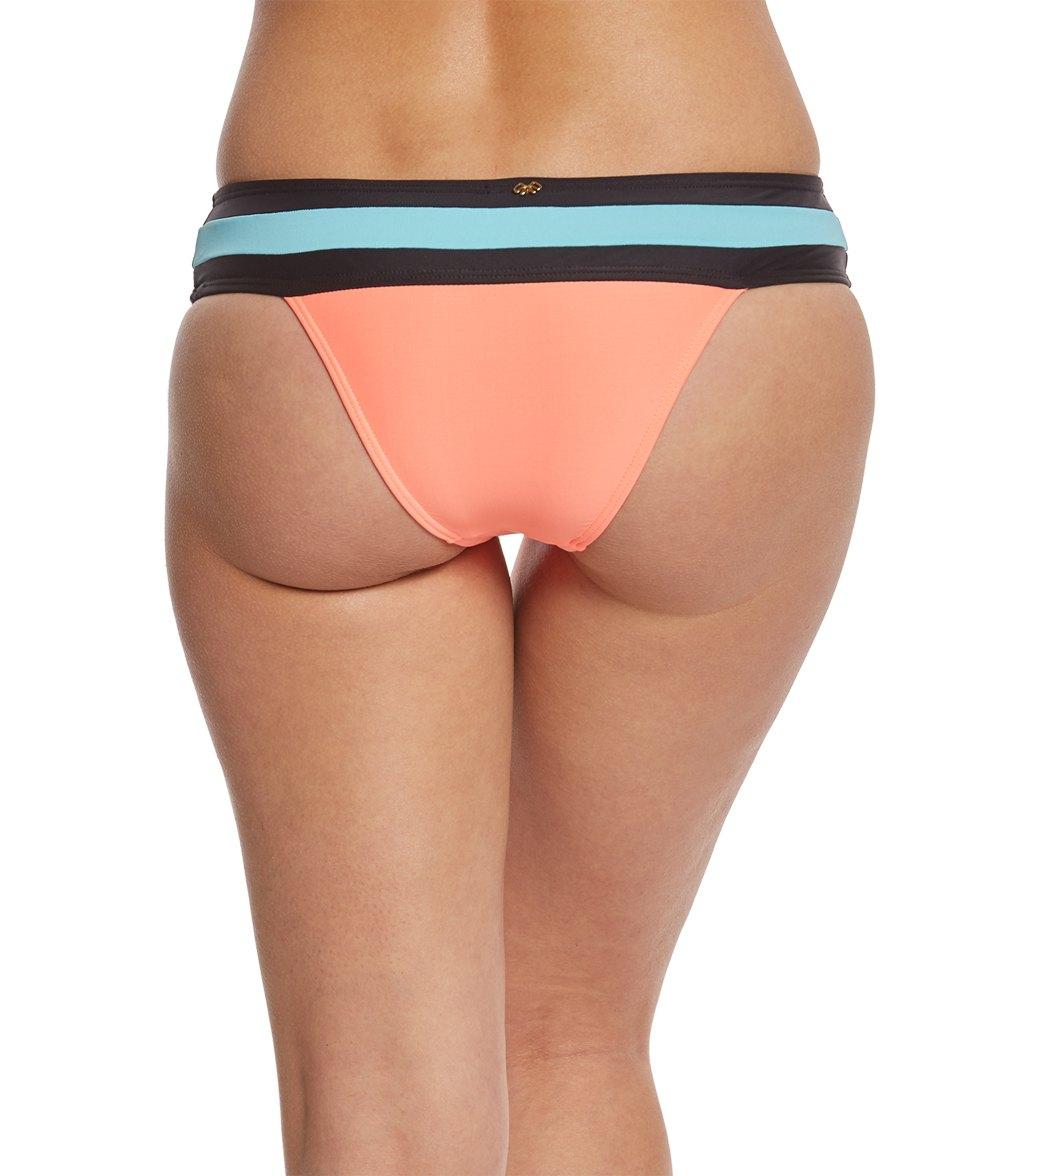 fe0a5ffb2ef PilyQ Swimwear Coral Banded Color Block Teeny Bikini Bottom at ...